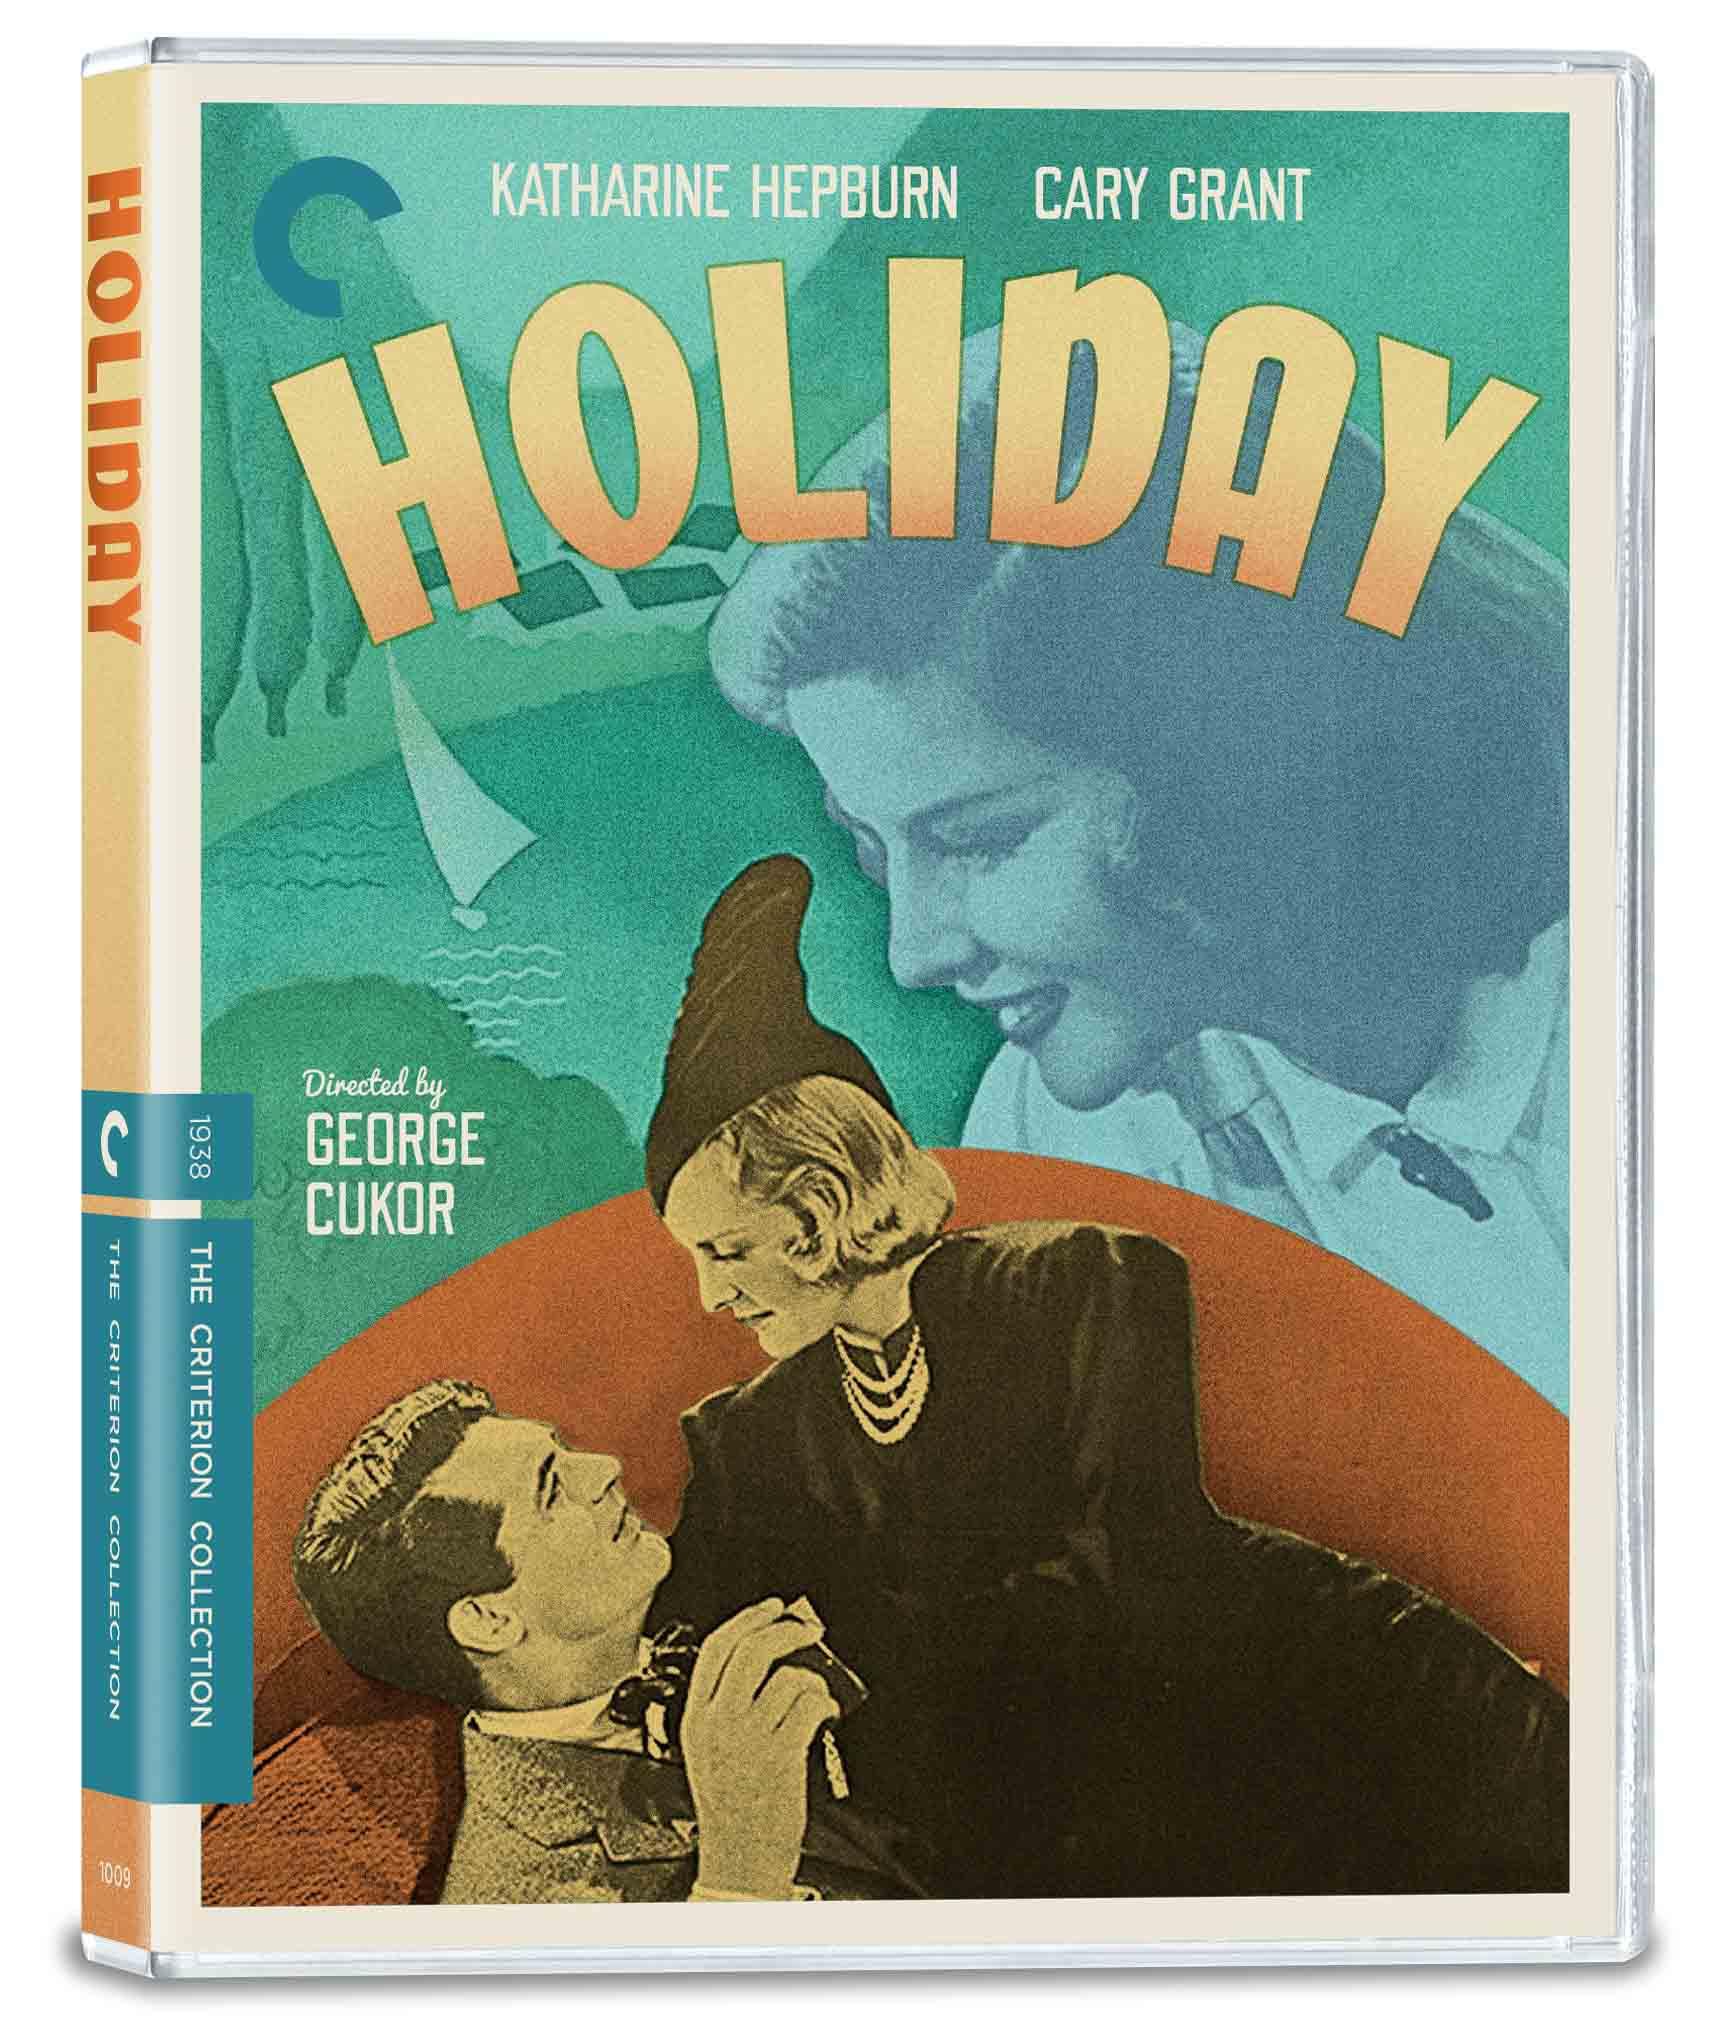 Buy Holiday (Blu-ray)